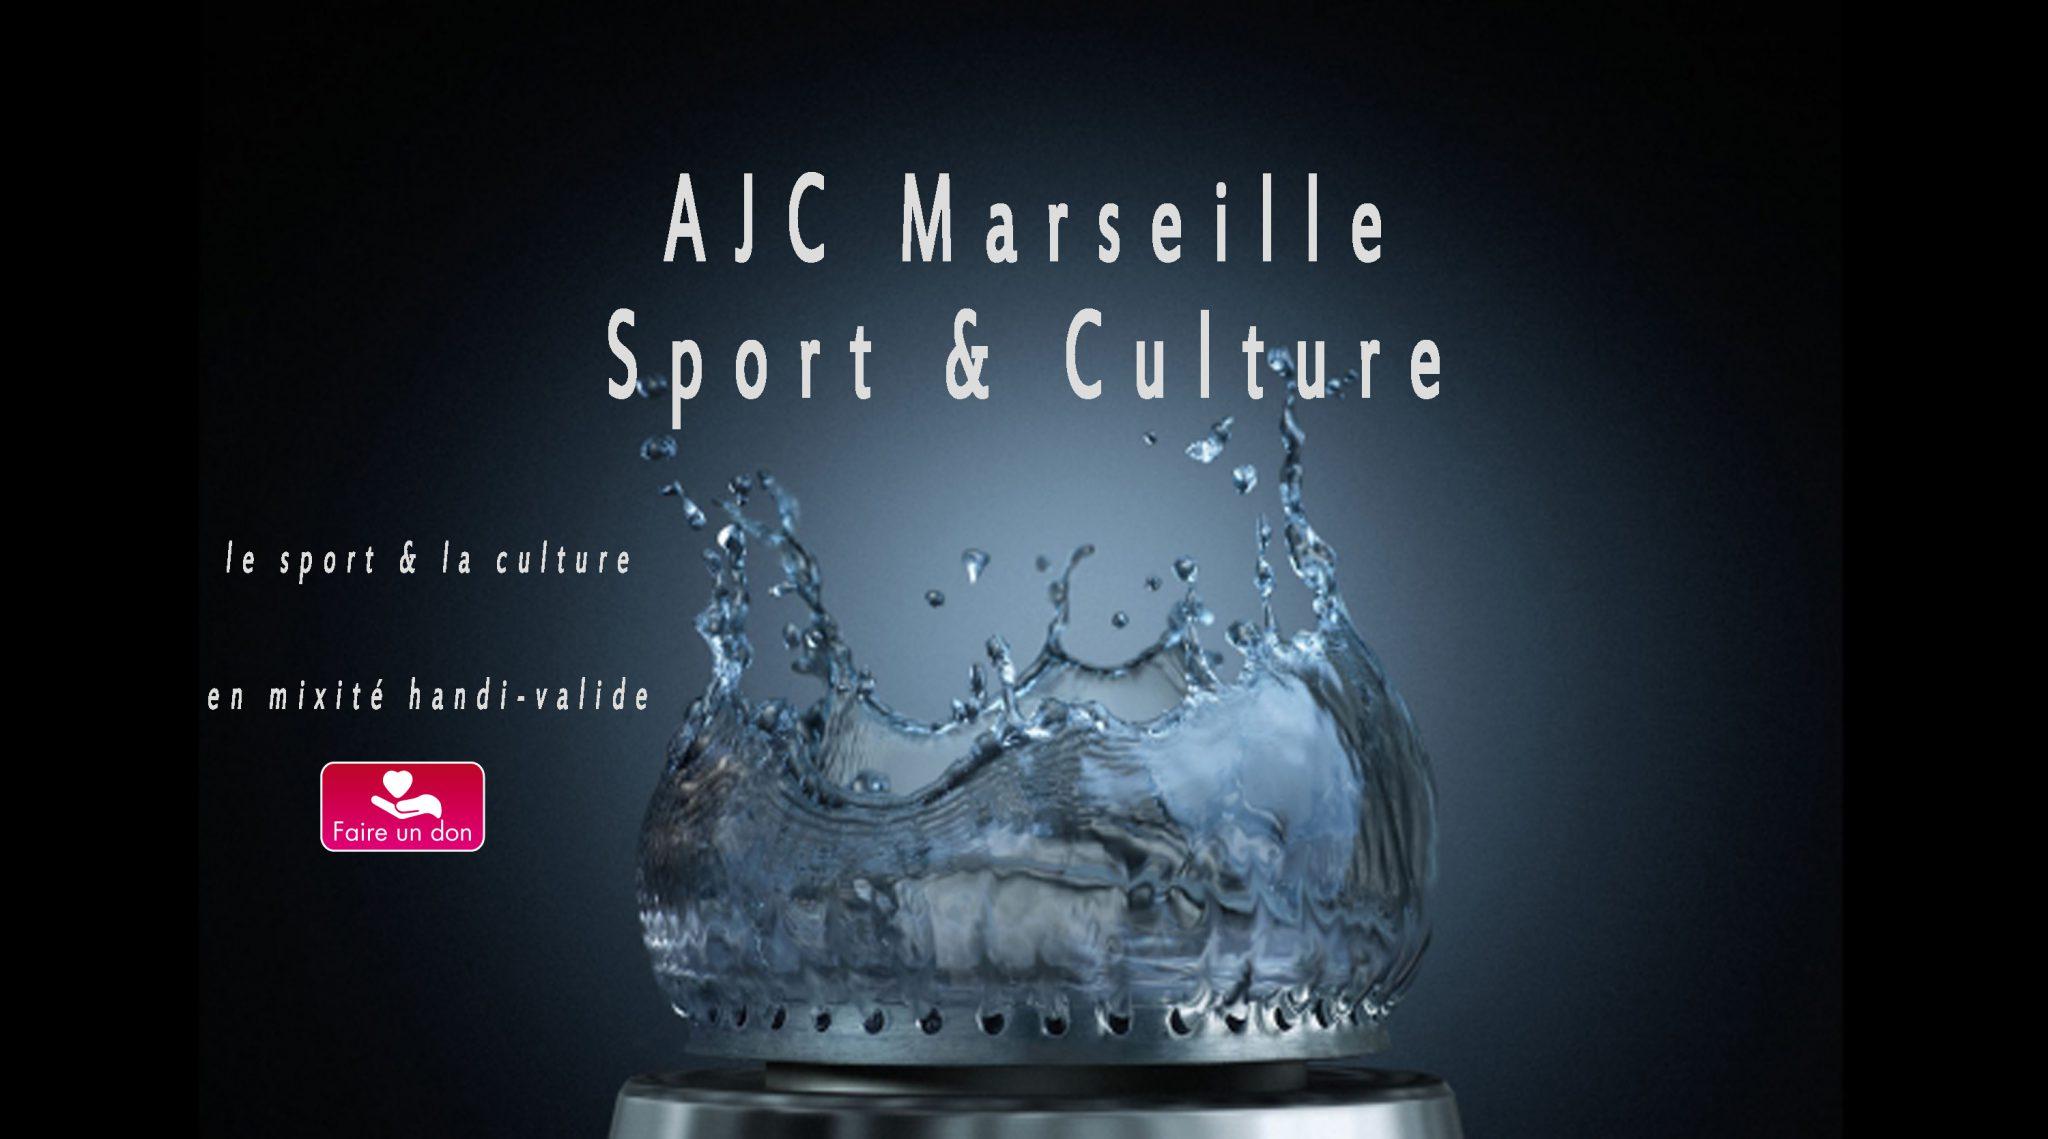 ajcmarseille sport  u0026 culture  u22c6 performeur social handi valide